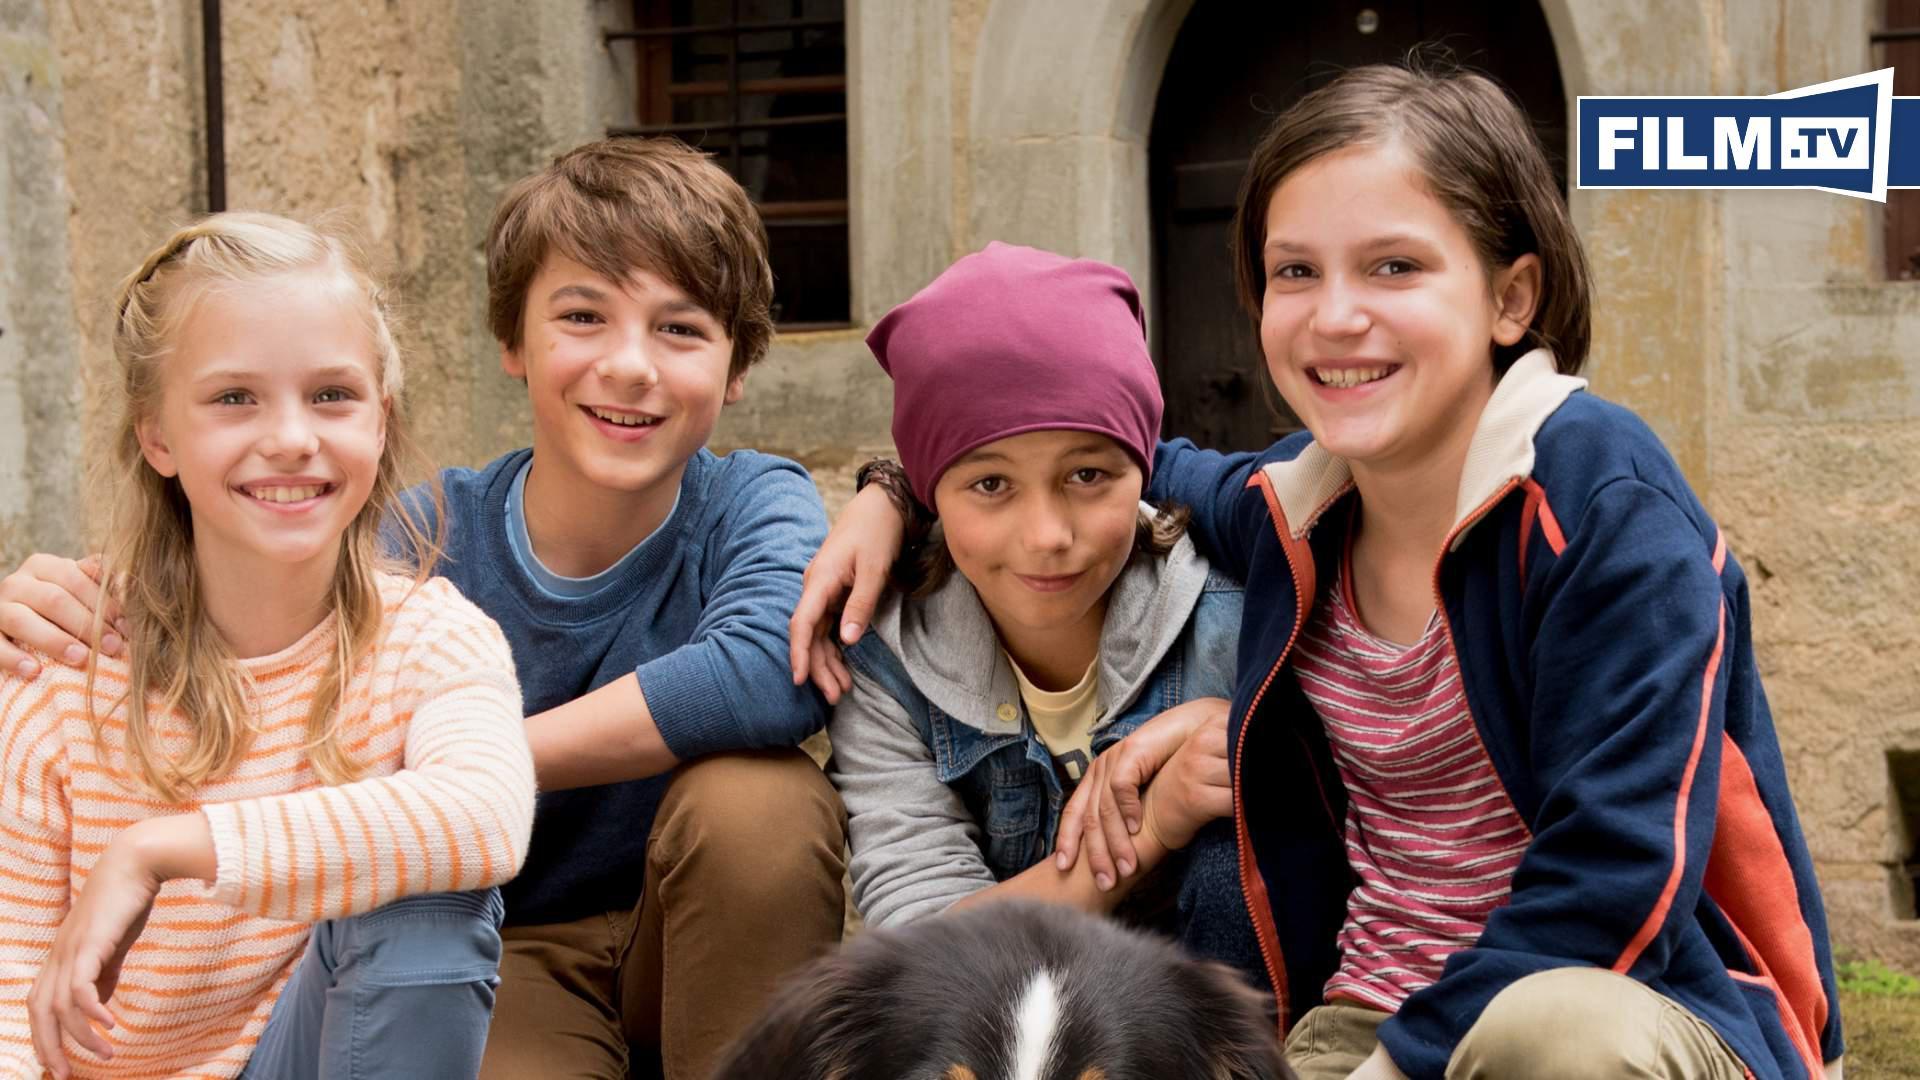 Fünf Freunde Film